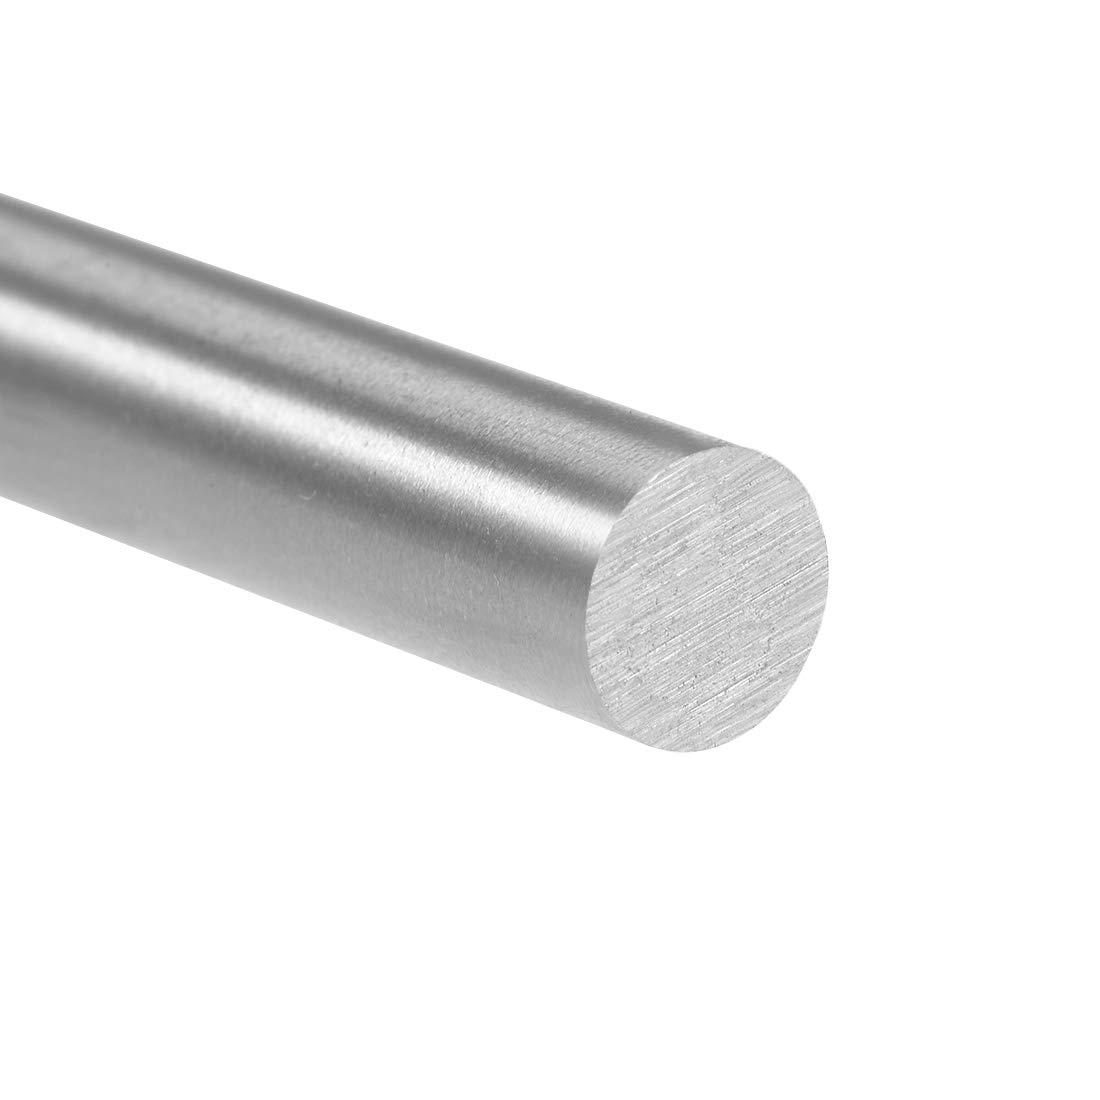 uxcell HSS Lathe Round Rod Solid Shaft Bar 6.5mm Dia 100mm Length 2Pcs